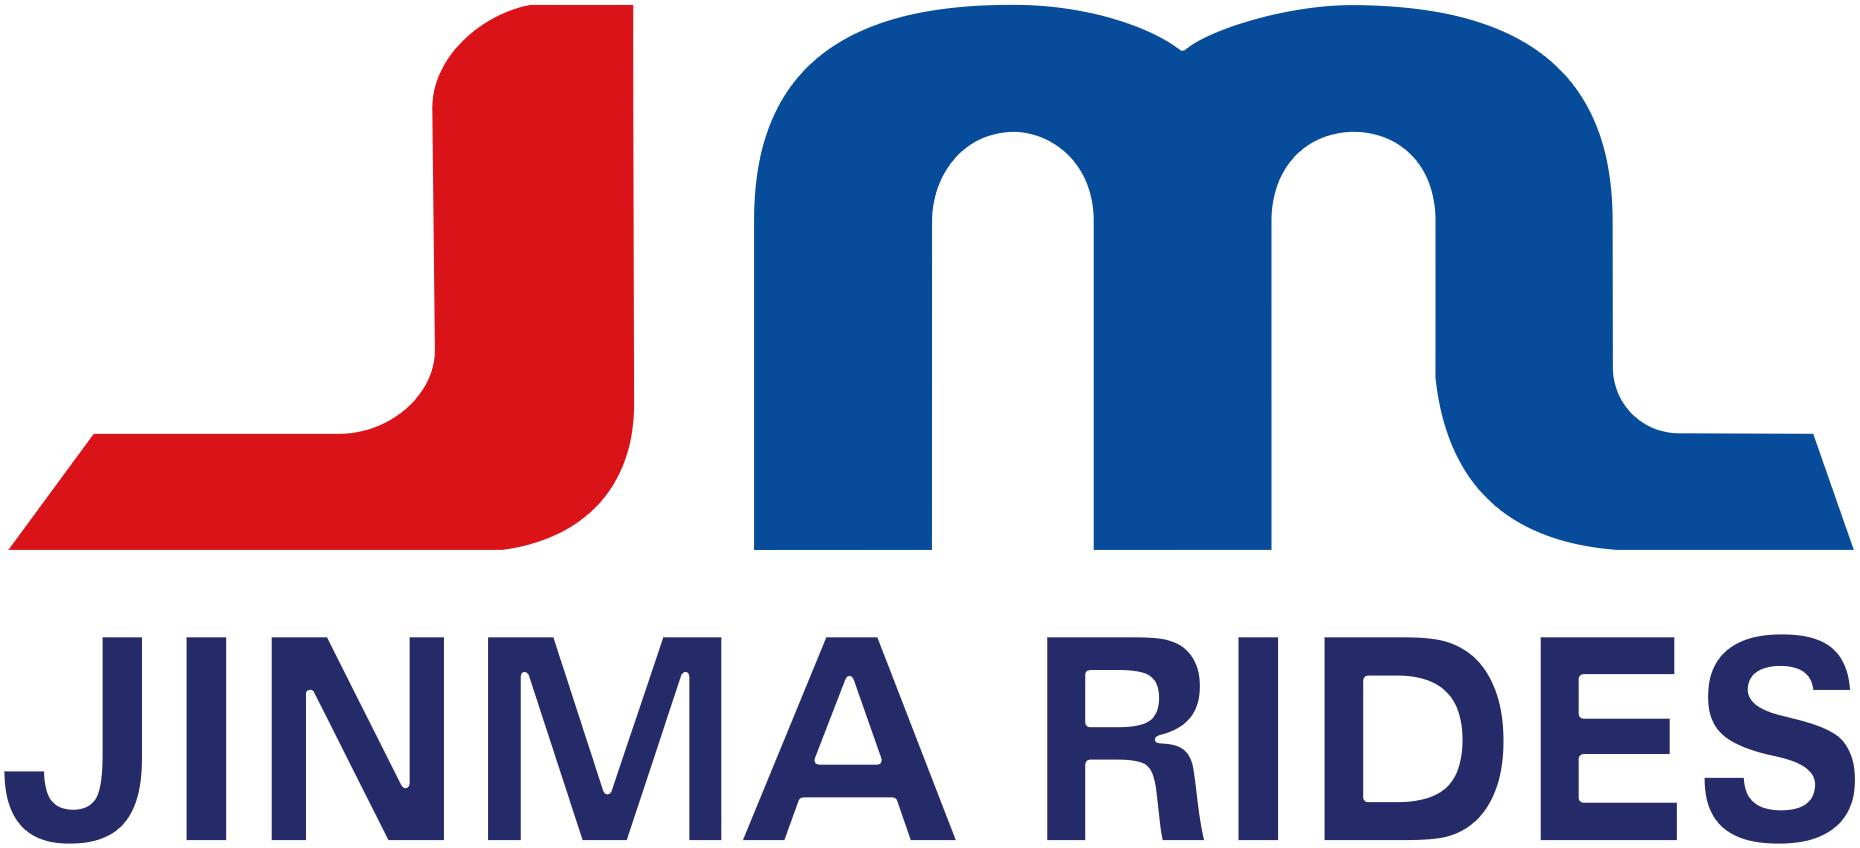 Jinma Rides Array image68